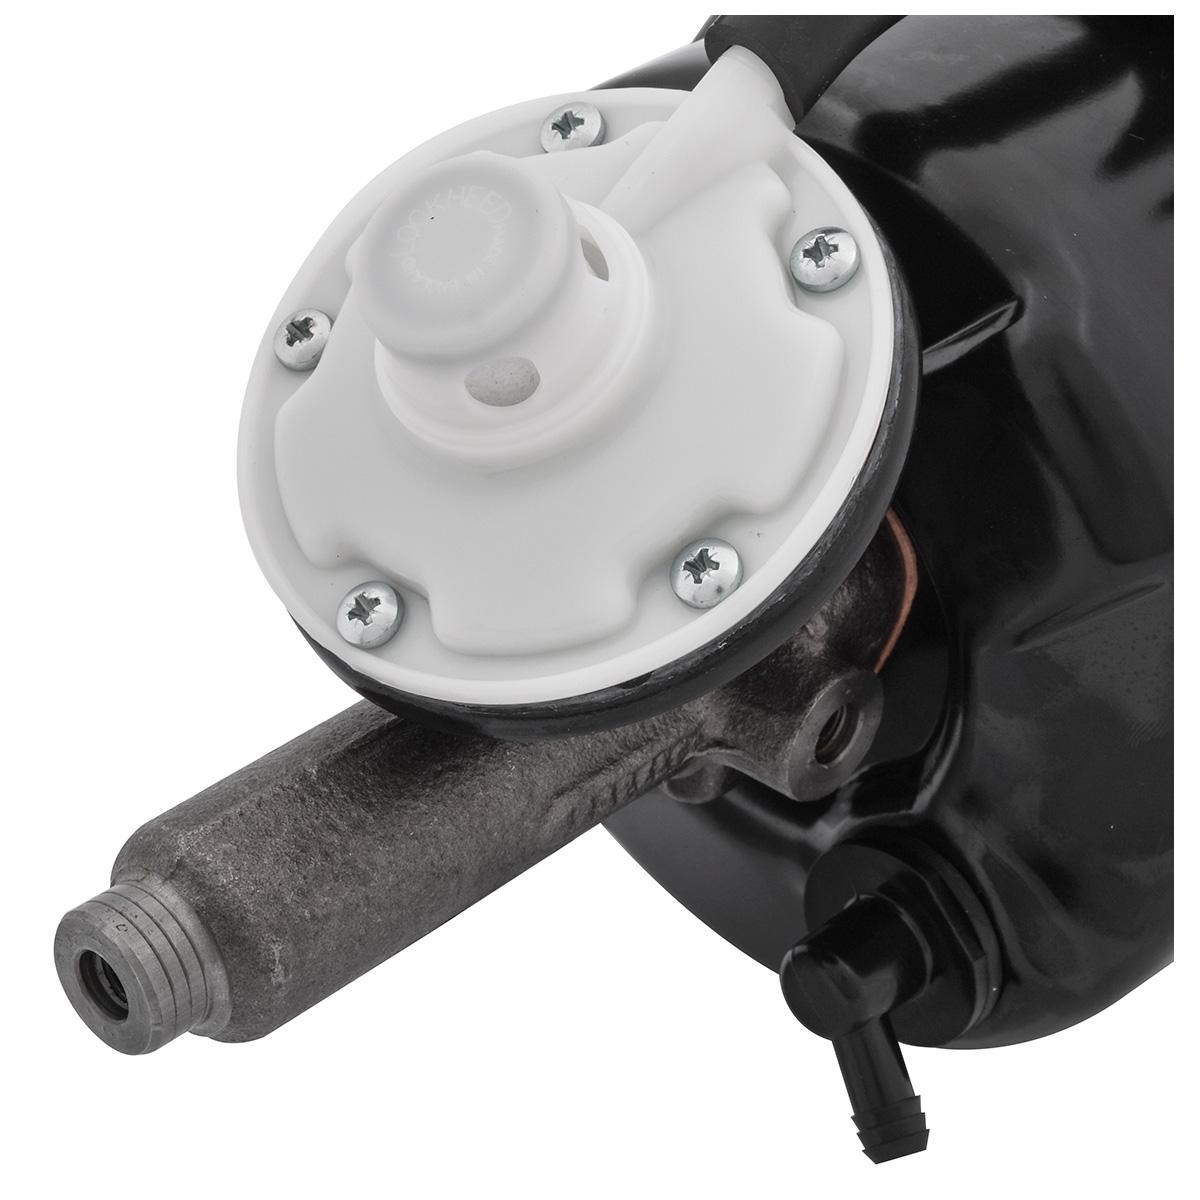 AUDI A3 8V 1.6D Rocker Cover Gasket 2014 on 03L103483 3L103483 Febi Quality New